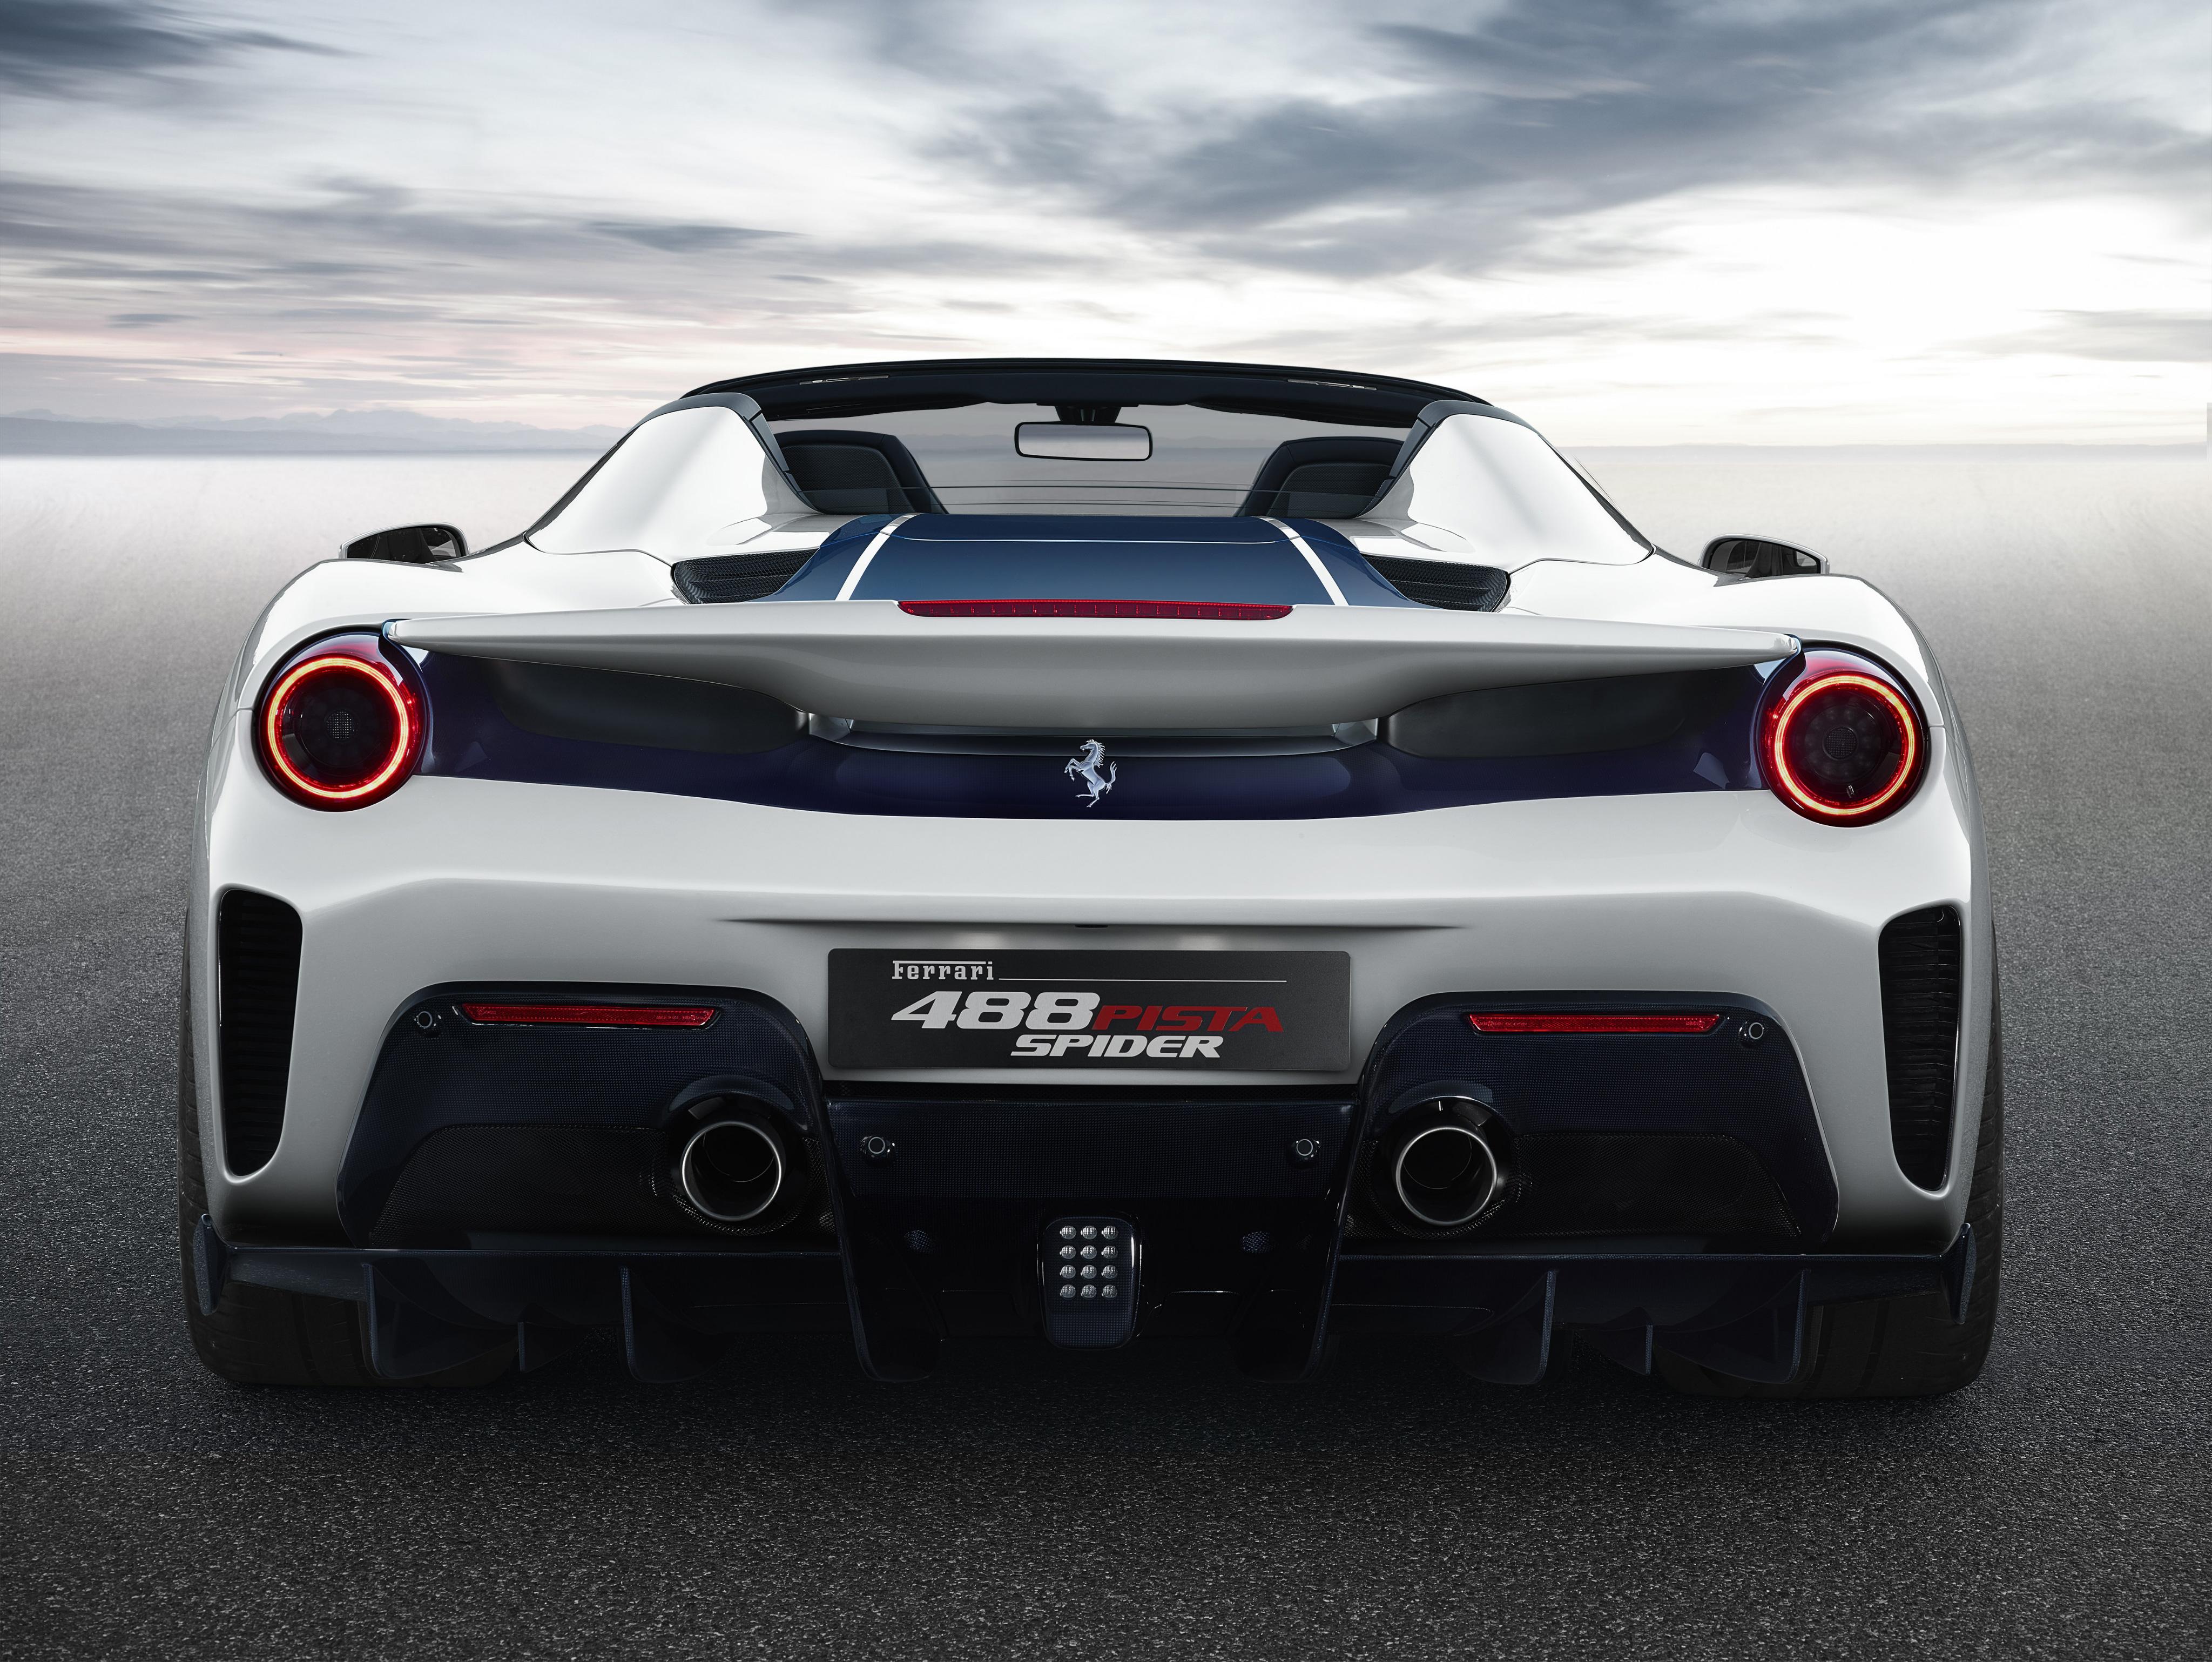 Ferrari 488 Wallpaper 4K